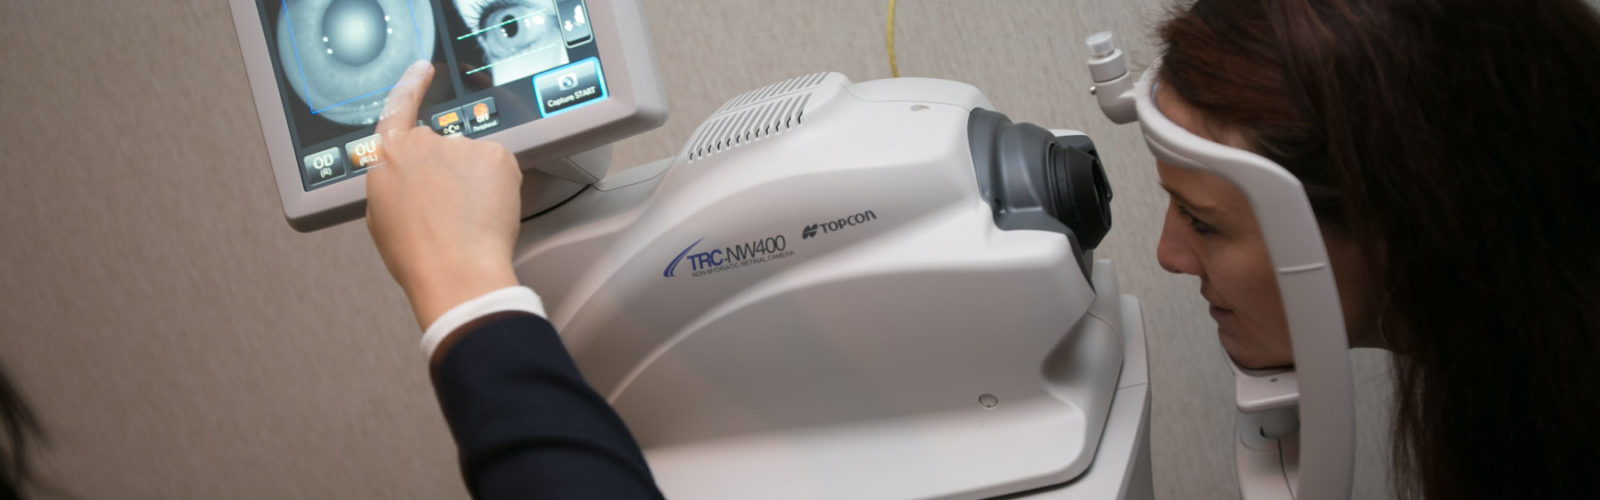 demonstration of camera for teleophthalmology